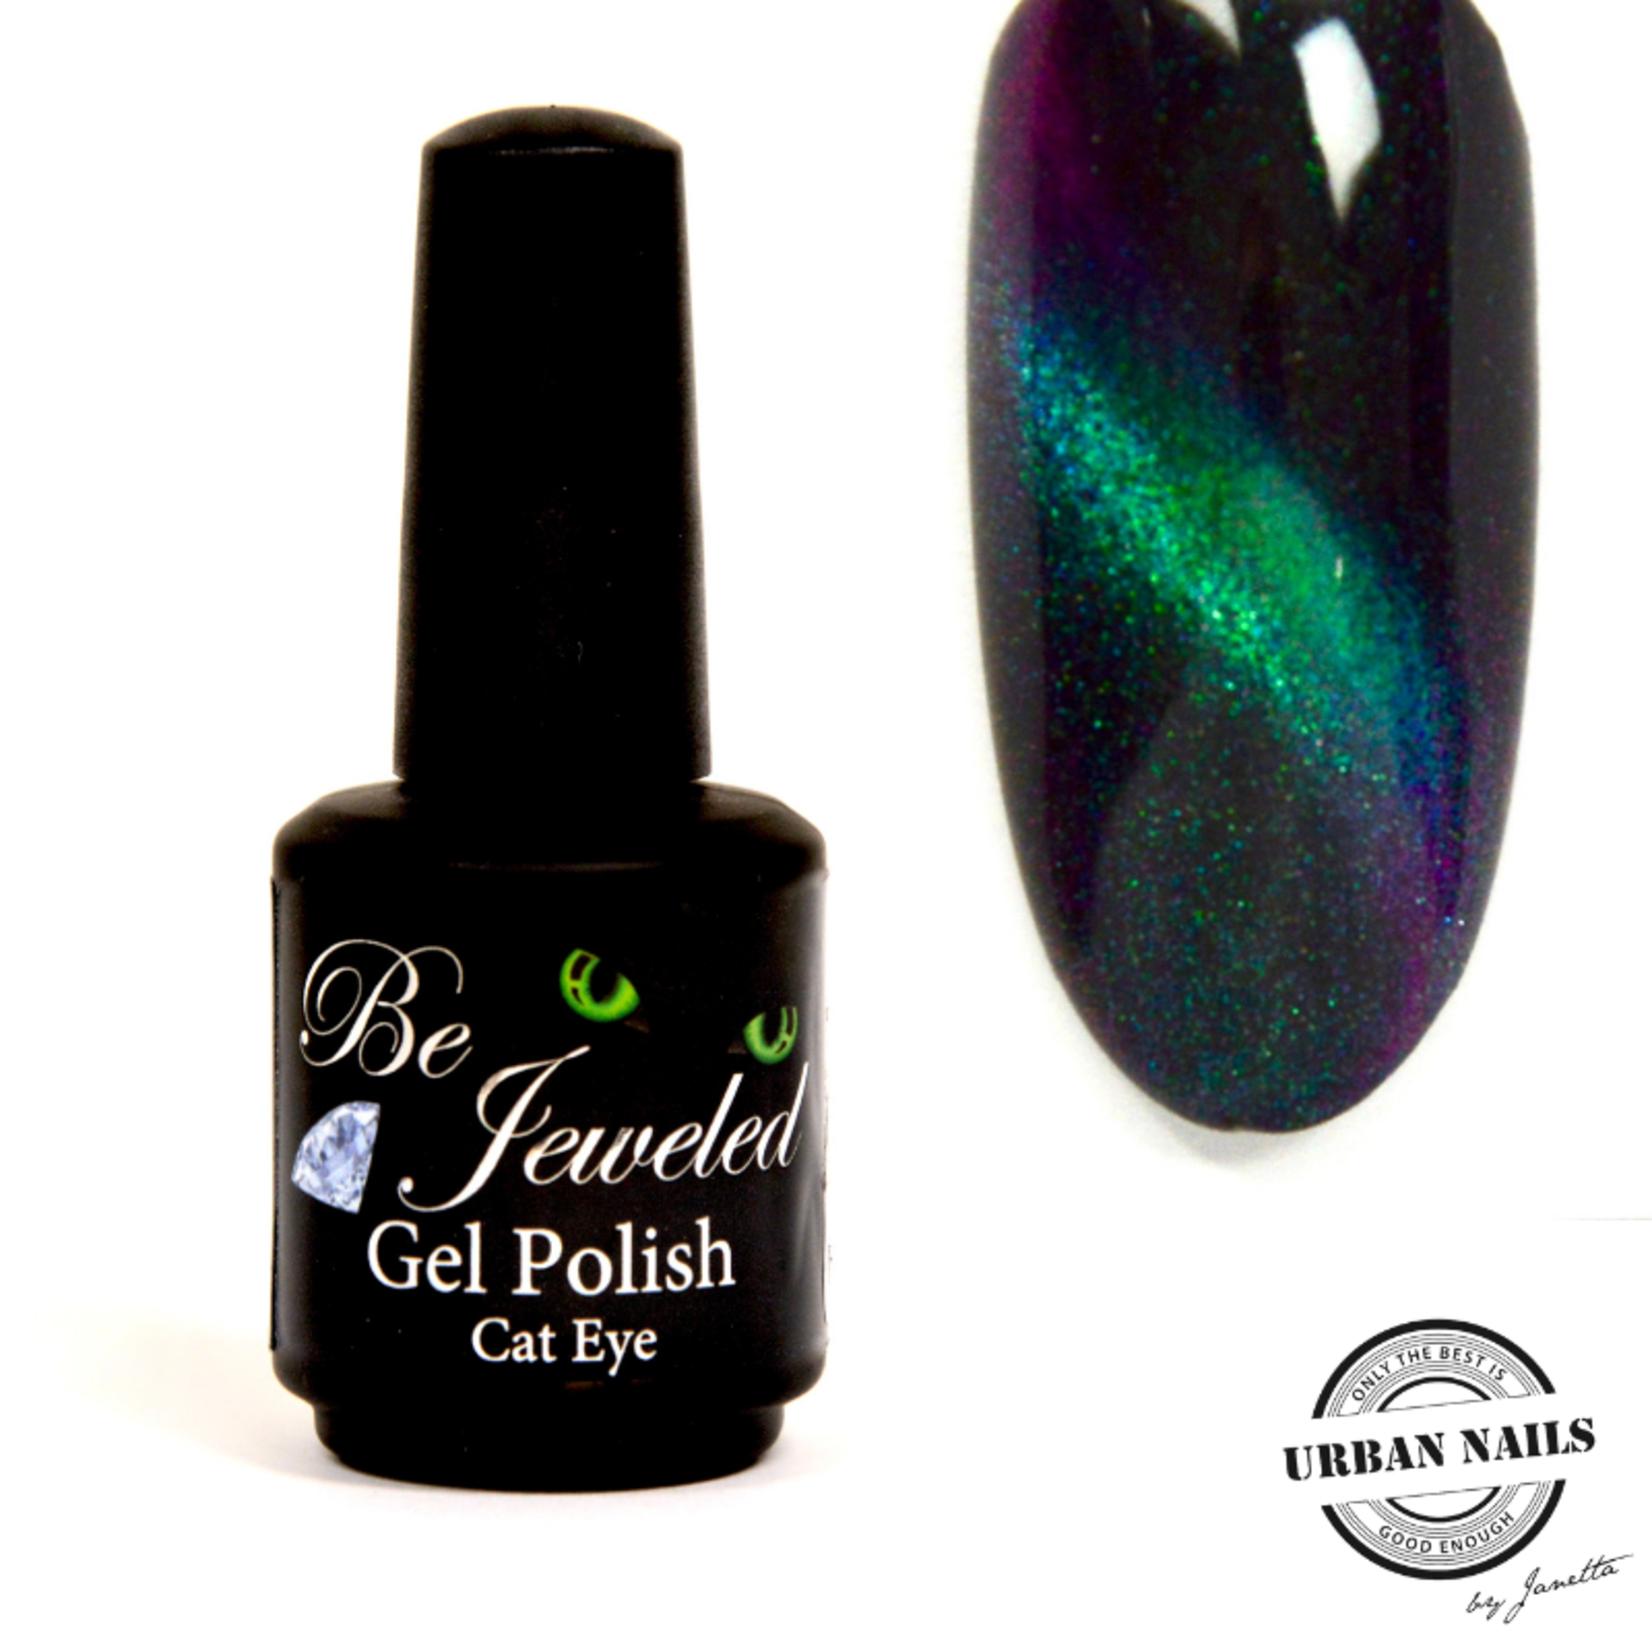 Urban Nails Be Jeweled Cateye 58 (Chameleon) Donker Groen Blauw